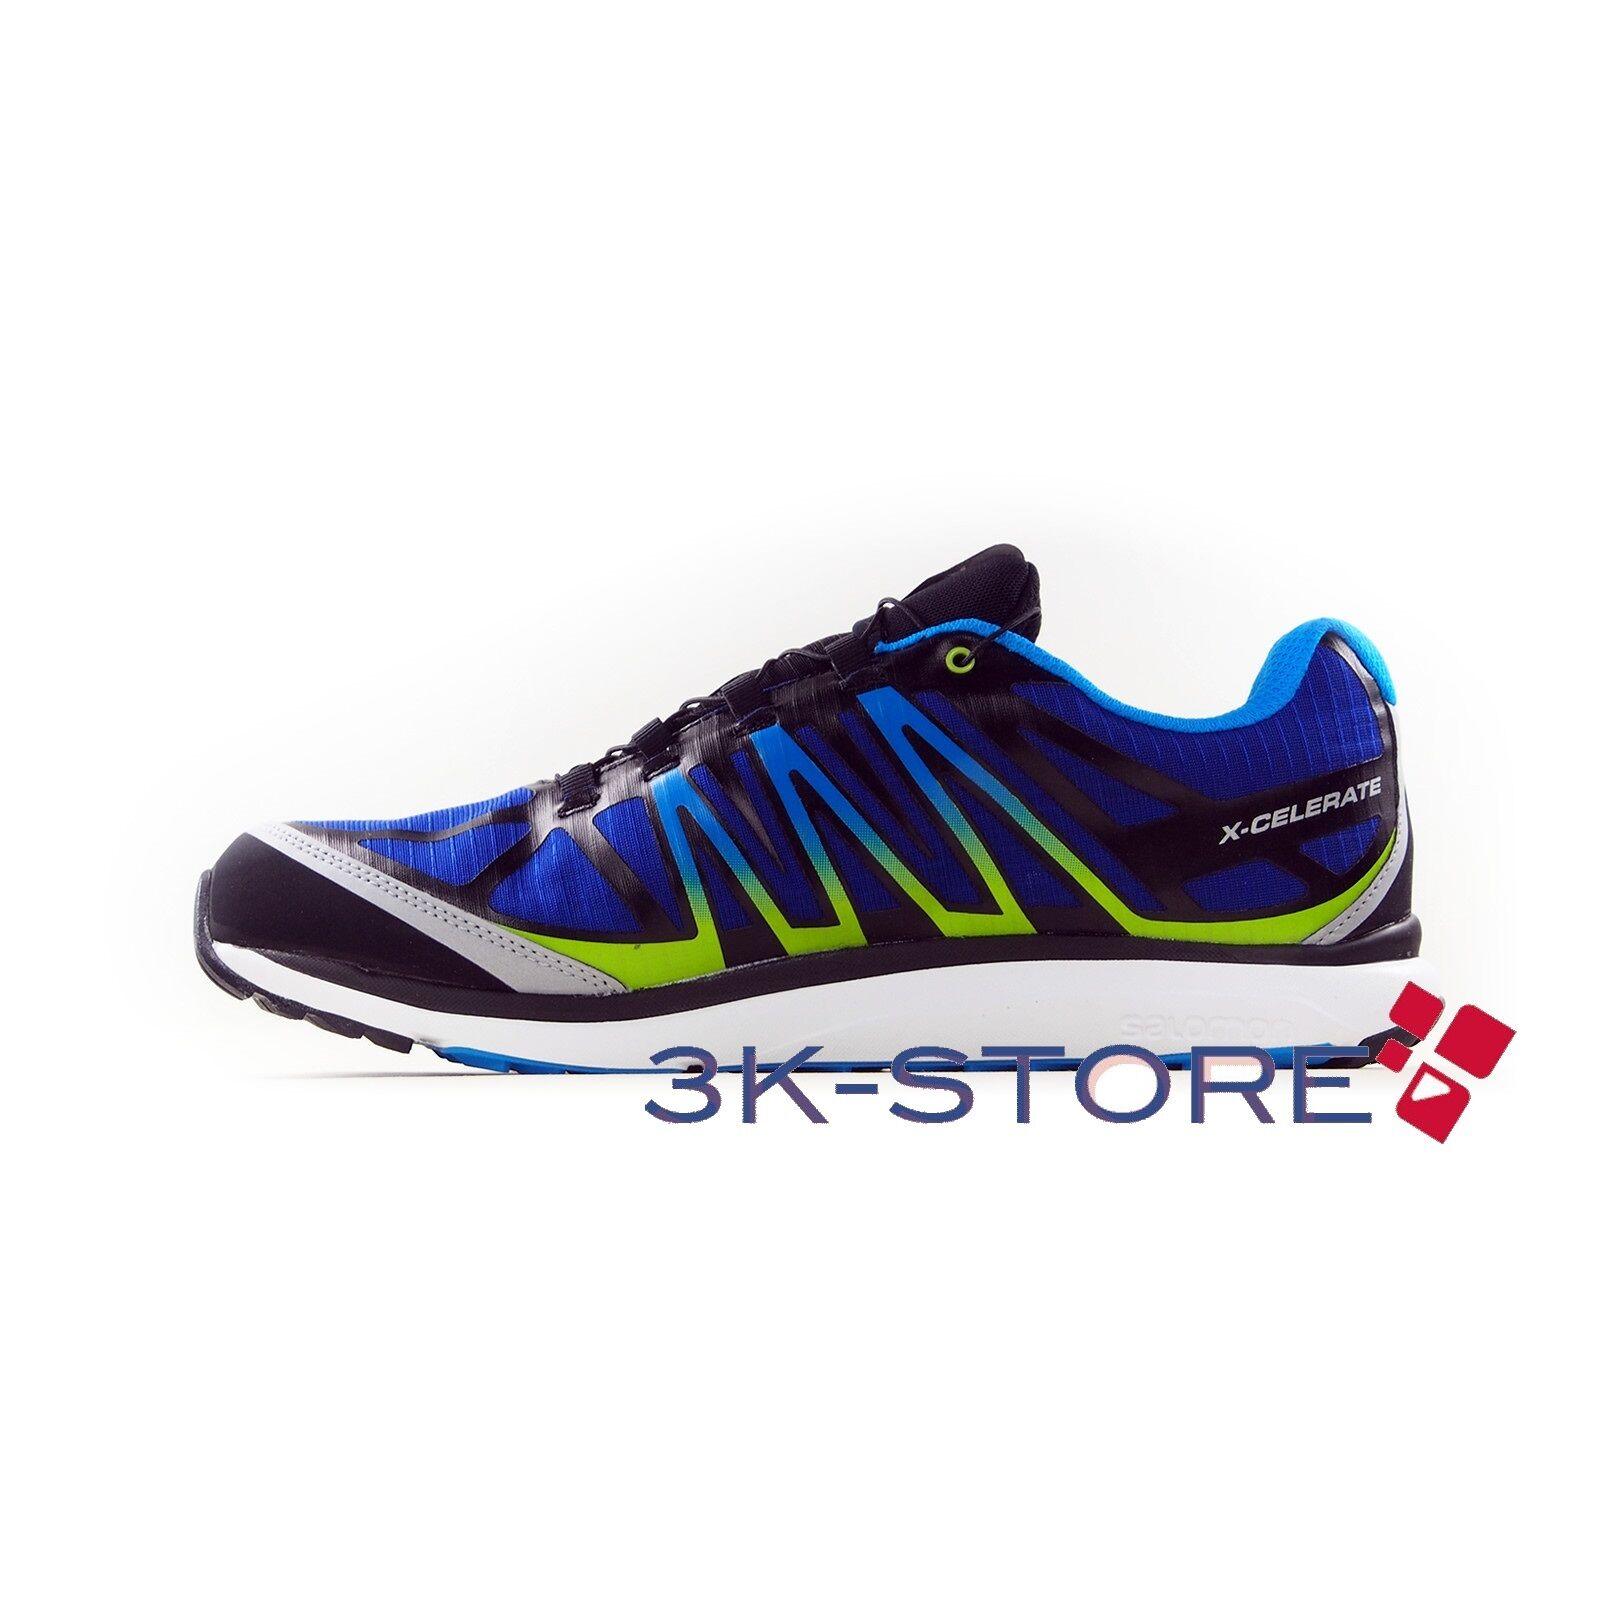 shoes men SALOMON X CELERATE GTX M blueE MONTAGNA TREKKING